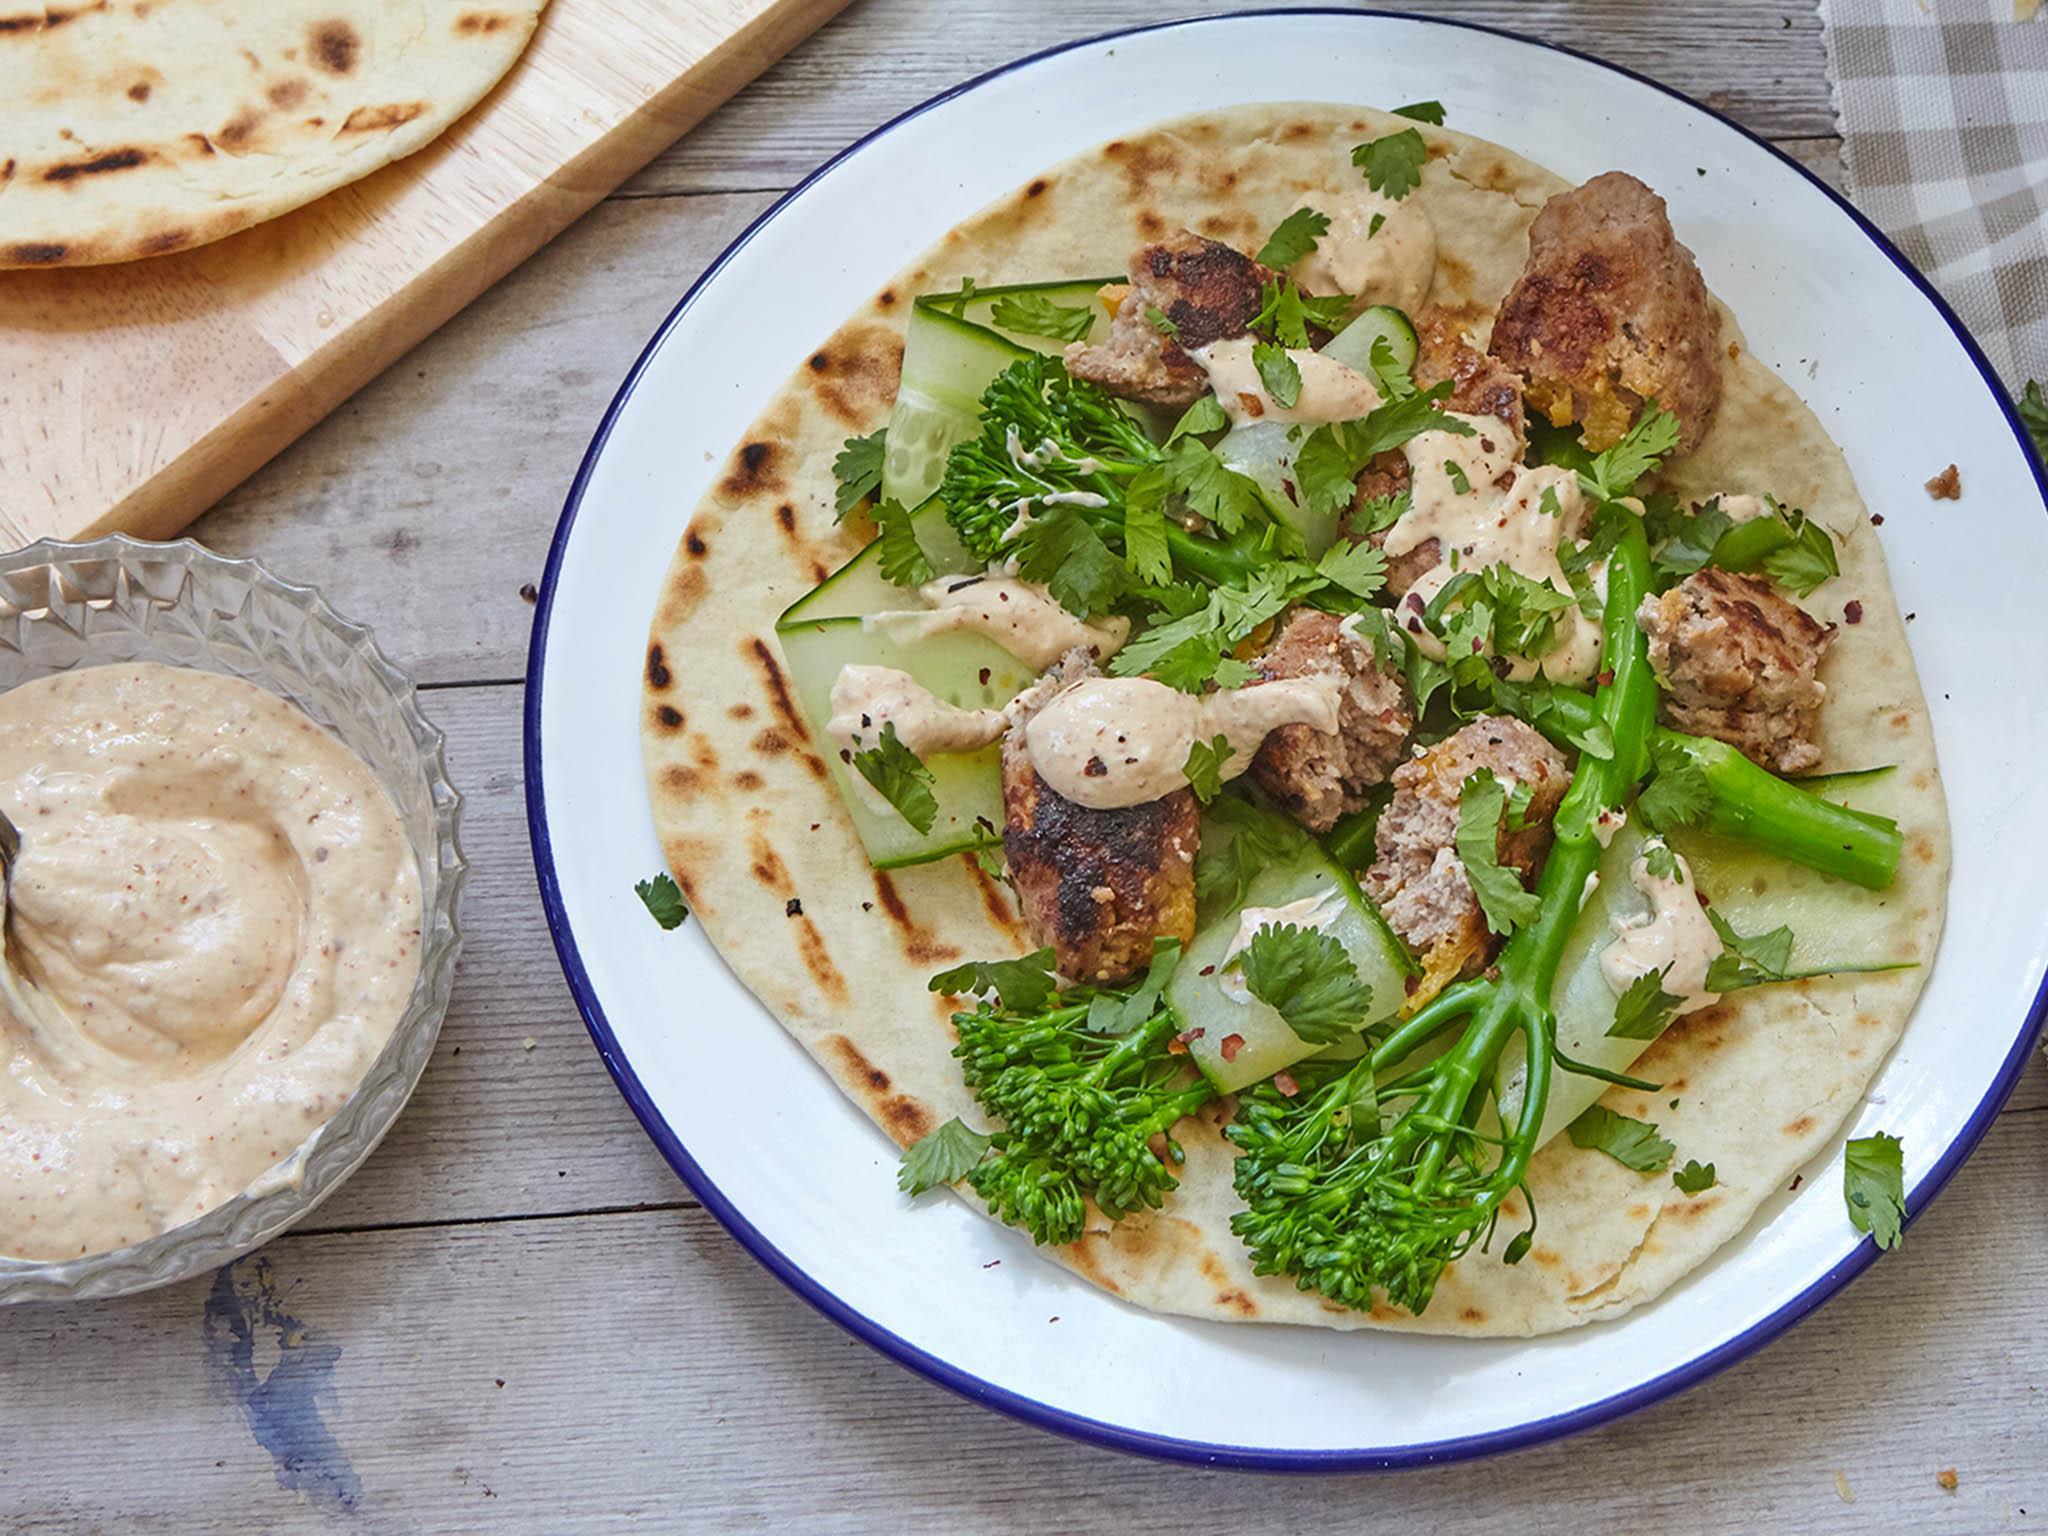 How to make lamb koftas with tenderstem broccoli and tahini sauce